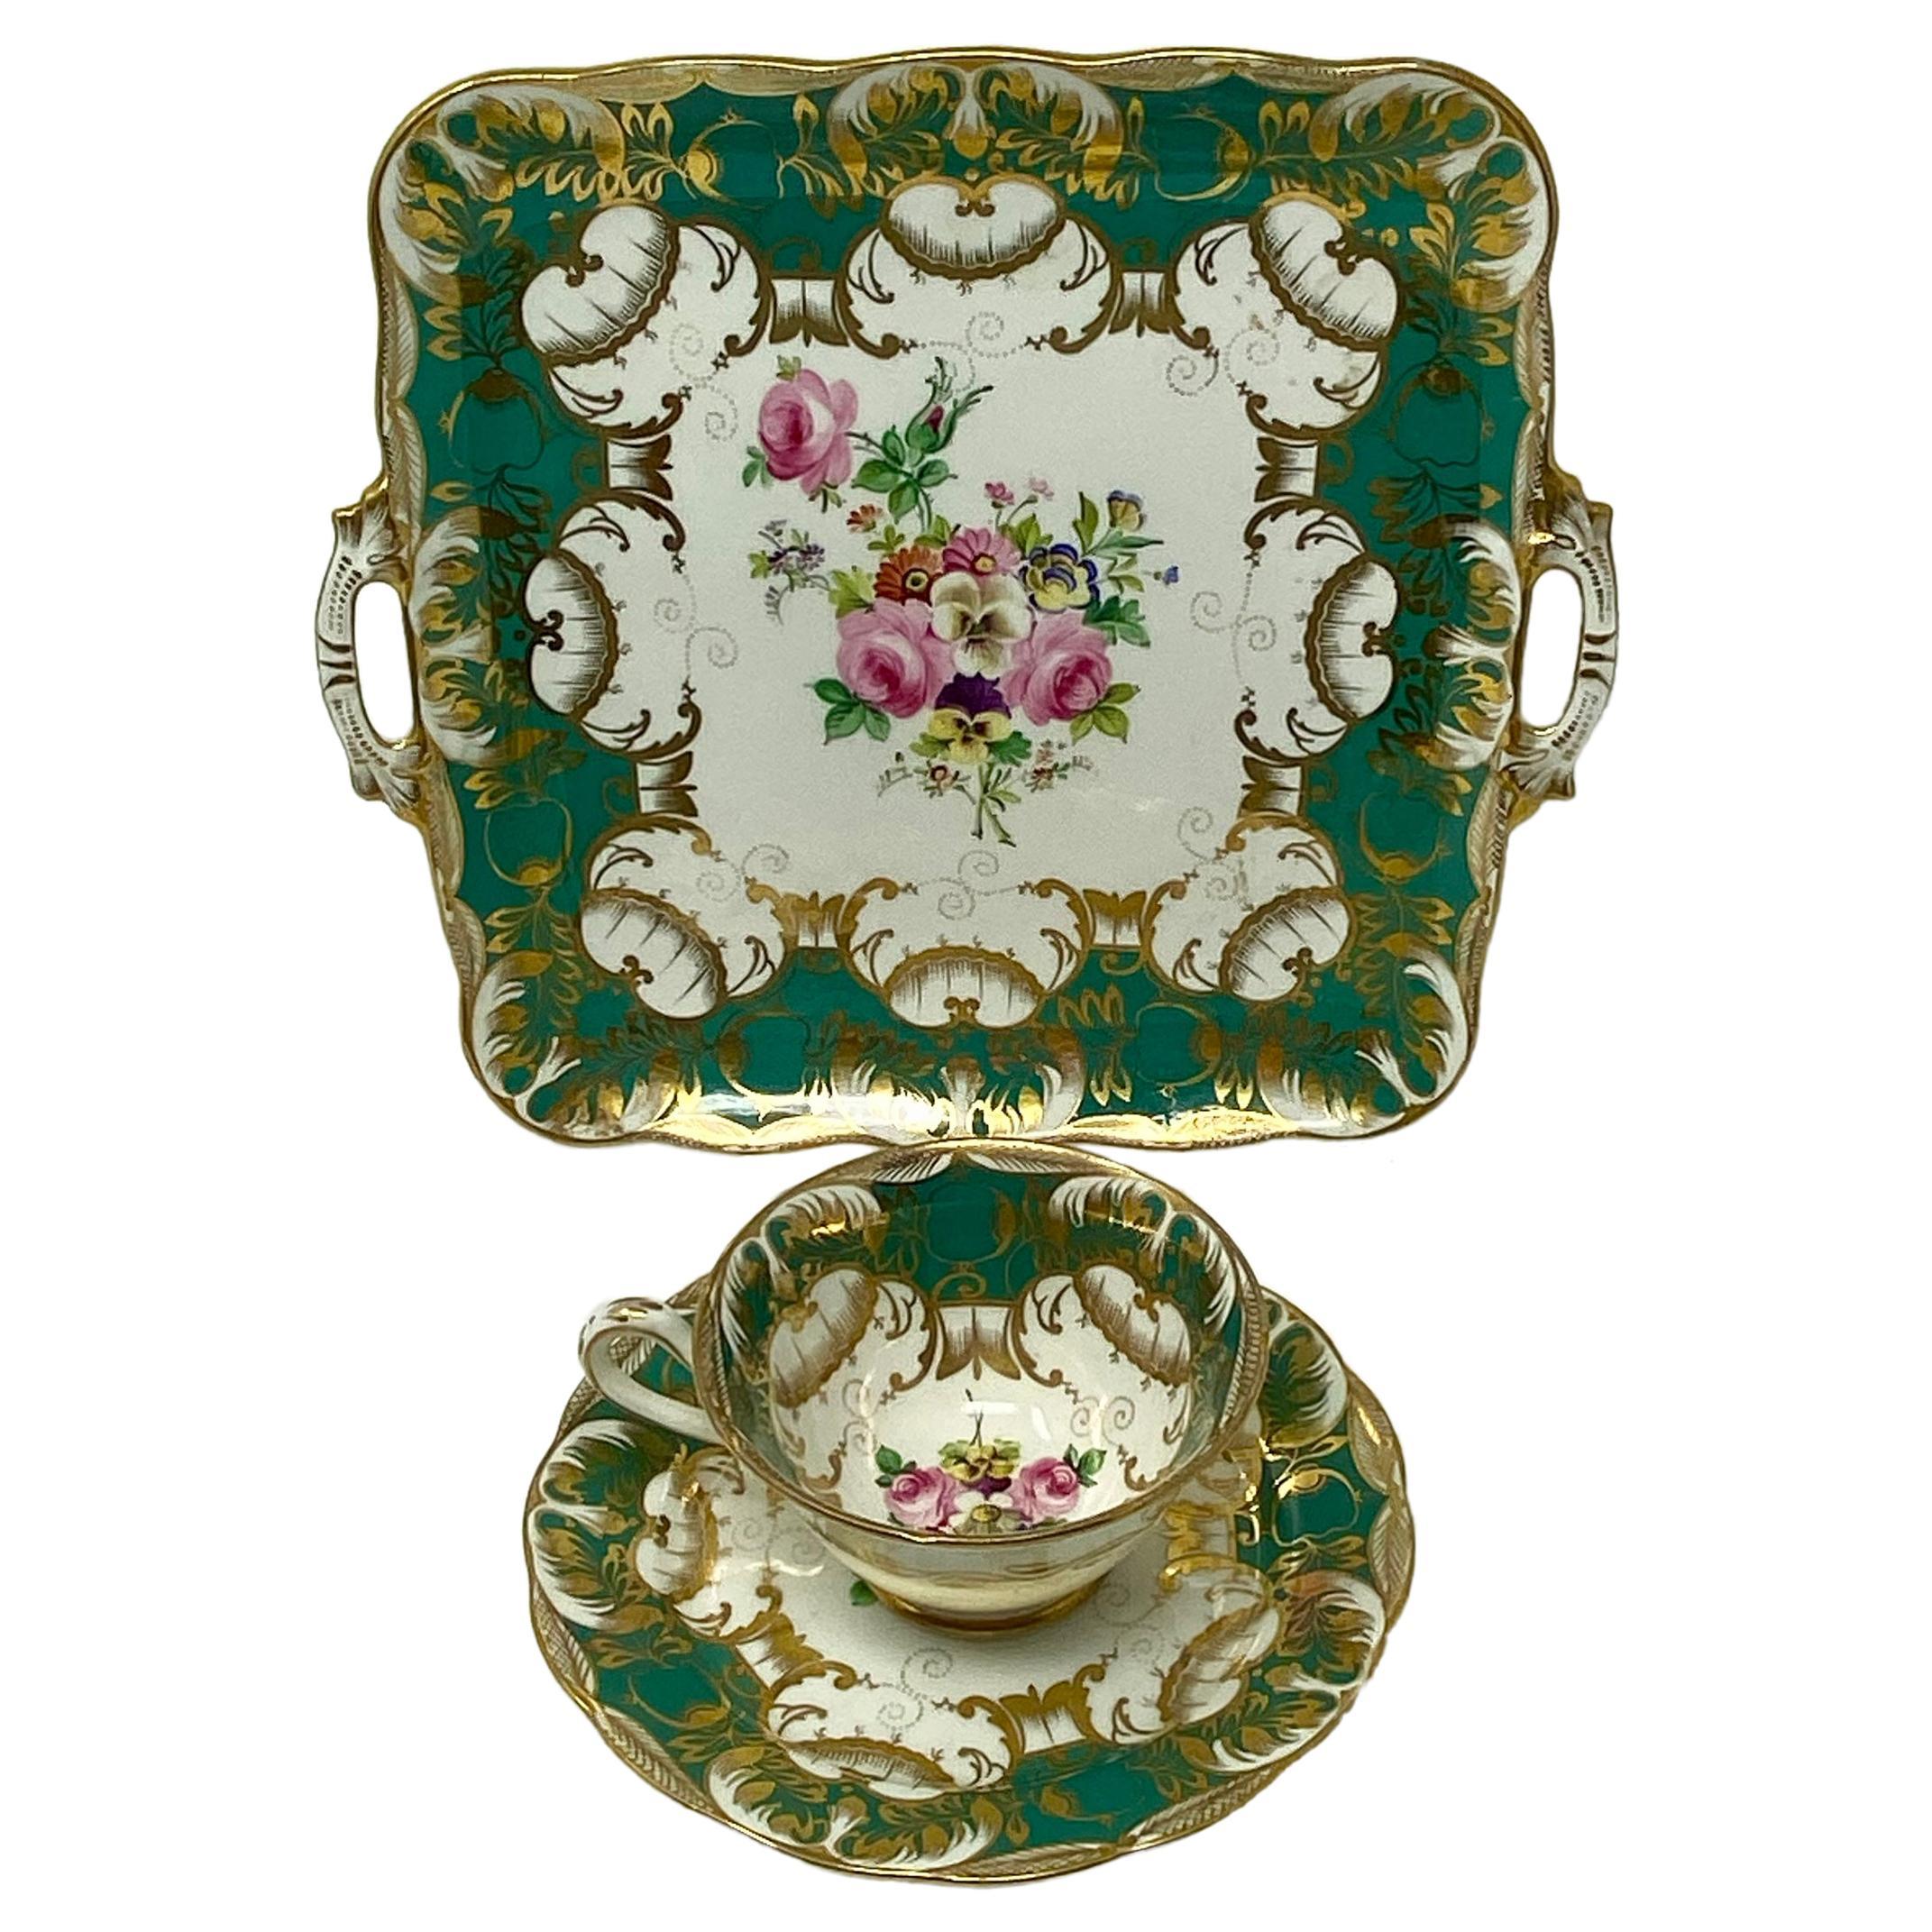 Antique English 19th Century Porcelain Dessert and Coffee Set